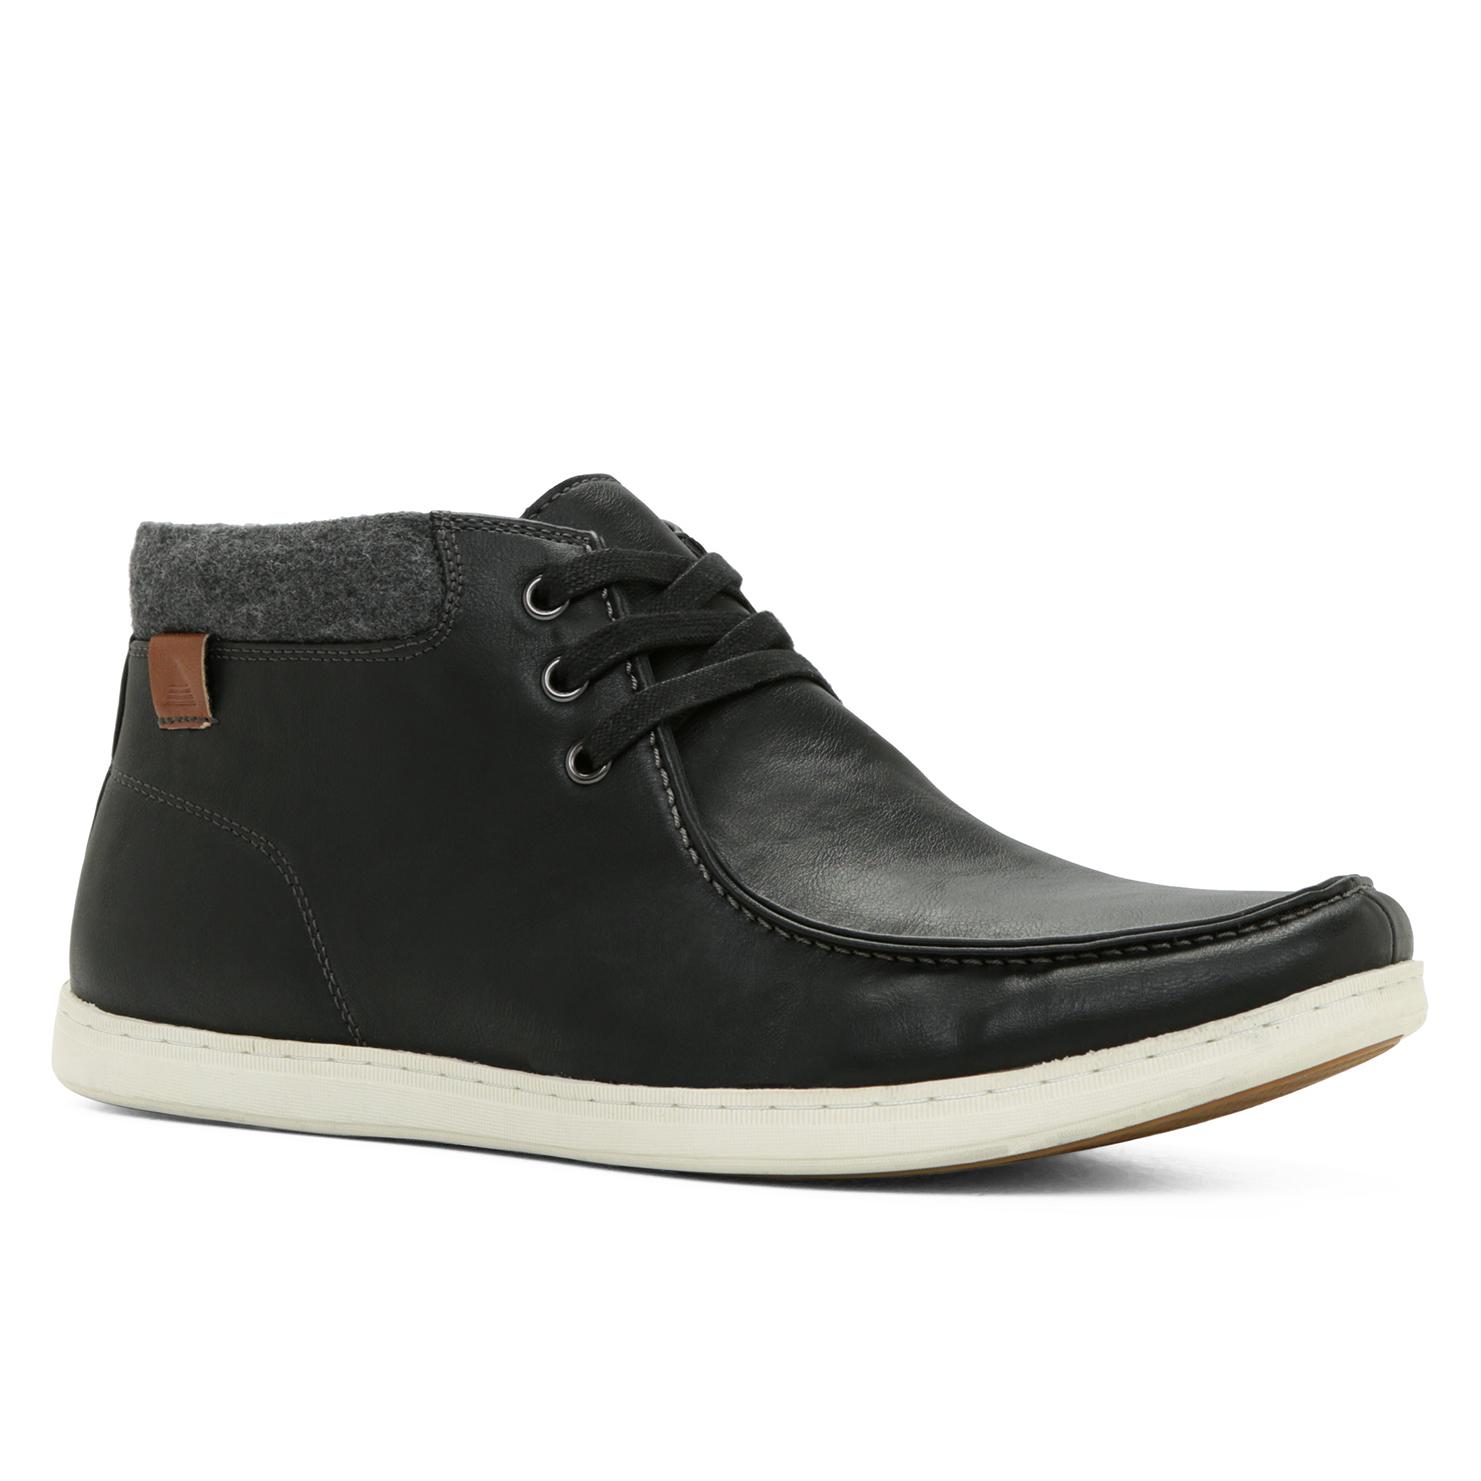 ALDO Synthetic Laufman in Black for Men